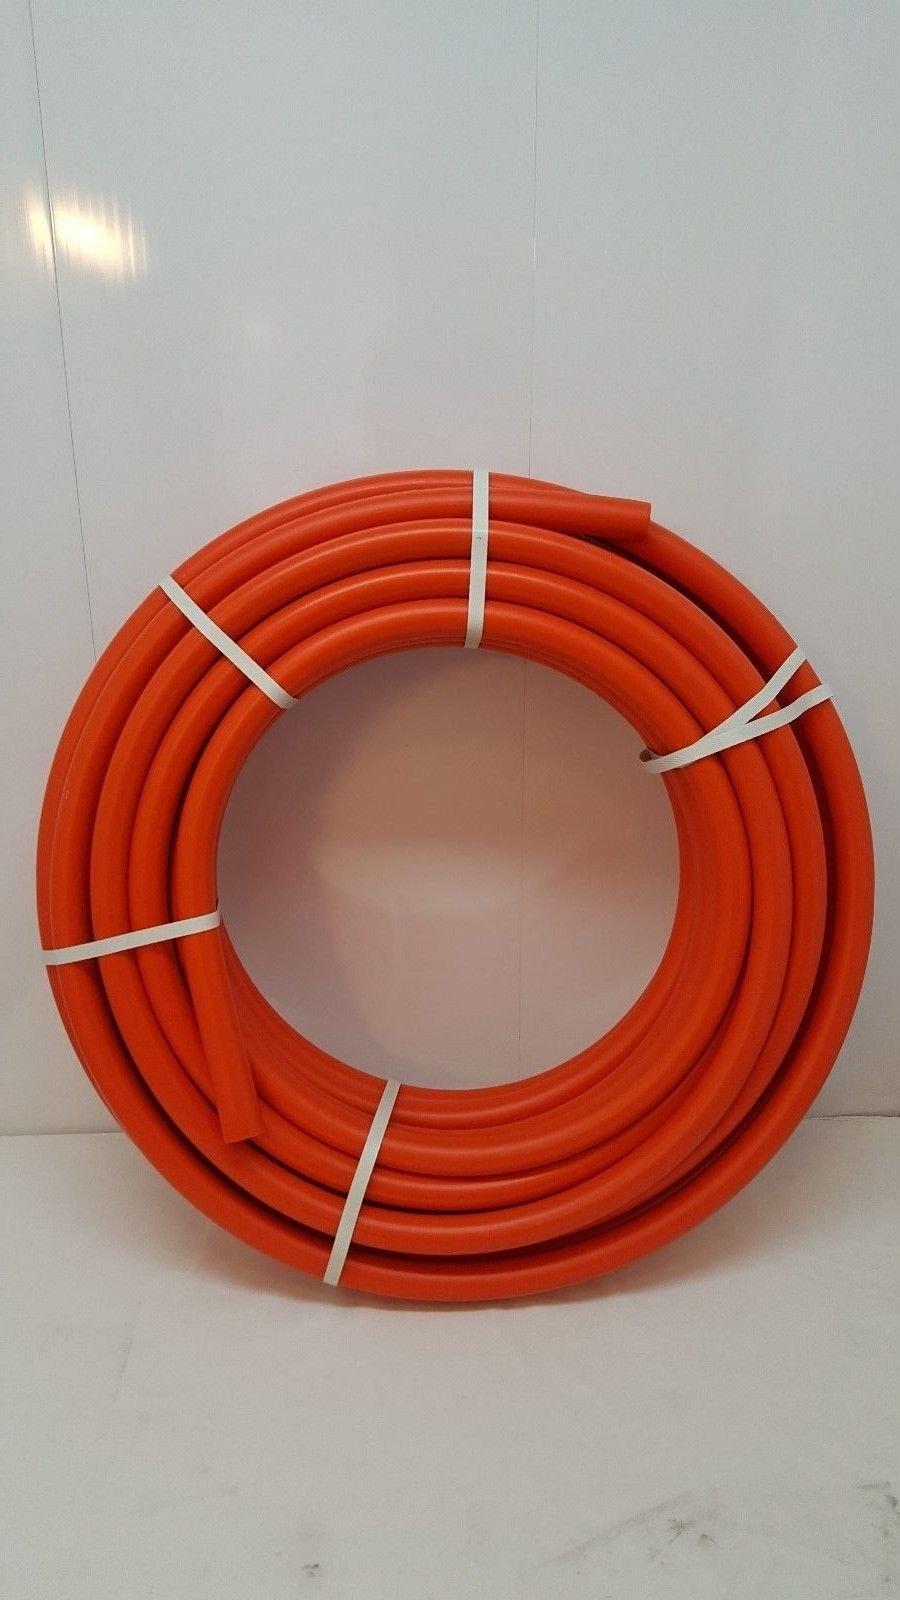 300' 1/2'' PEX AL PEX tubing for heating, plumbing